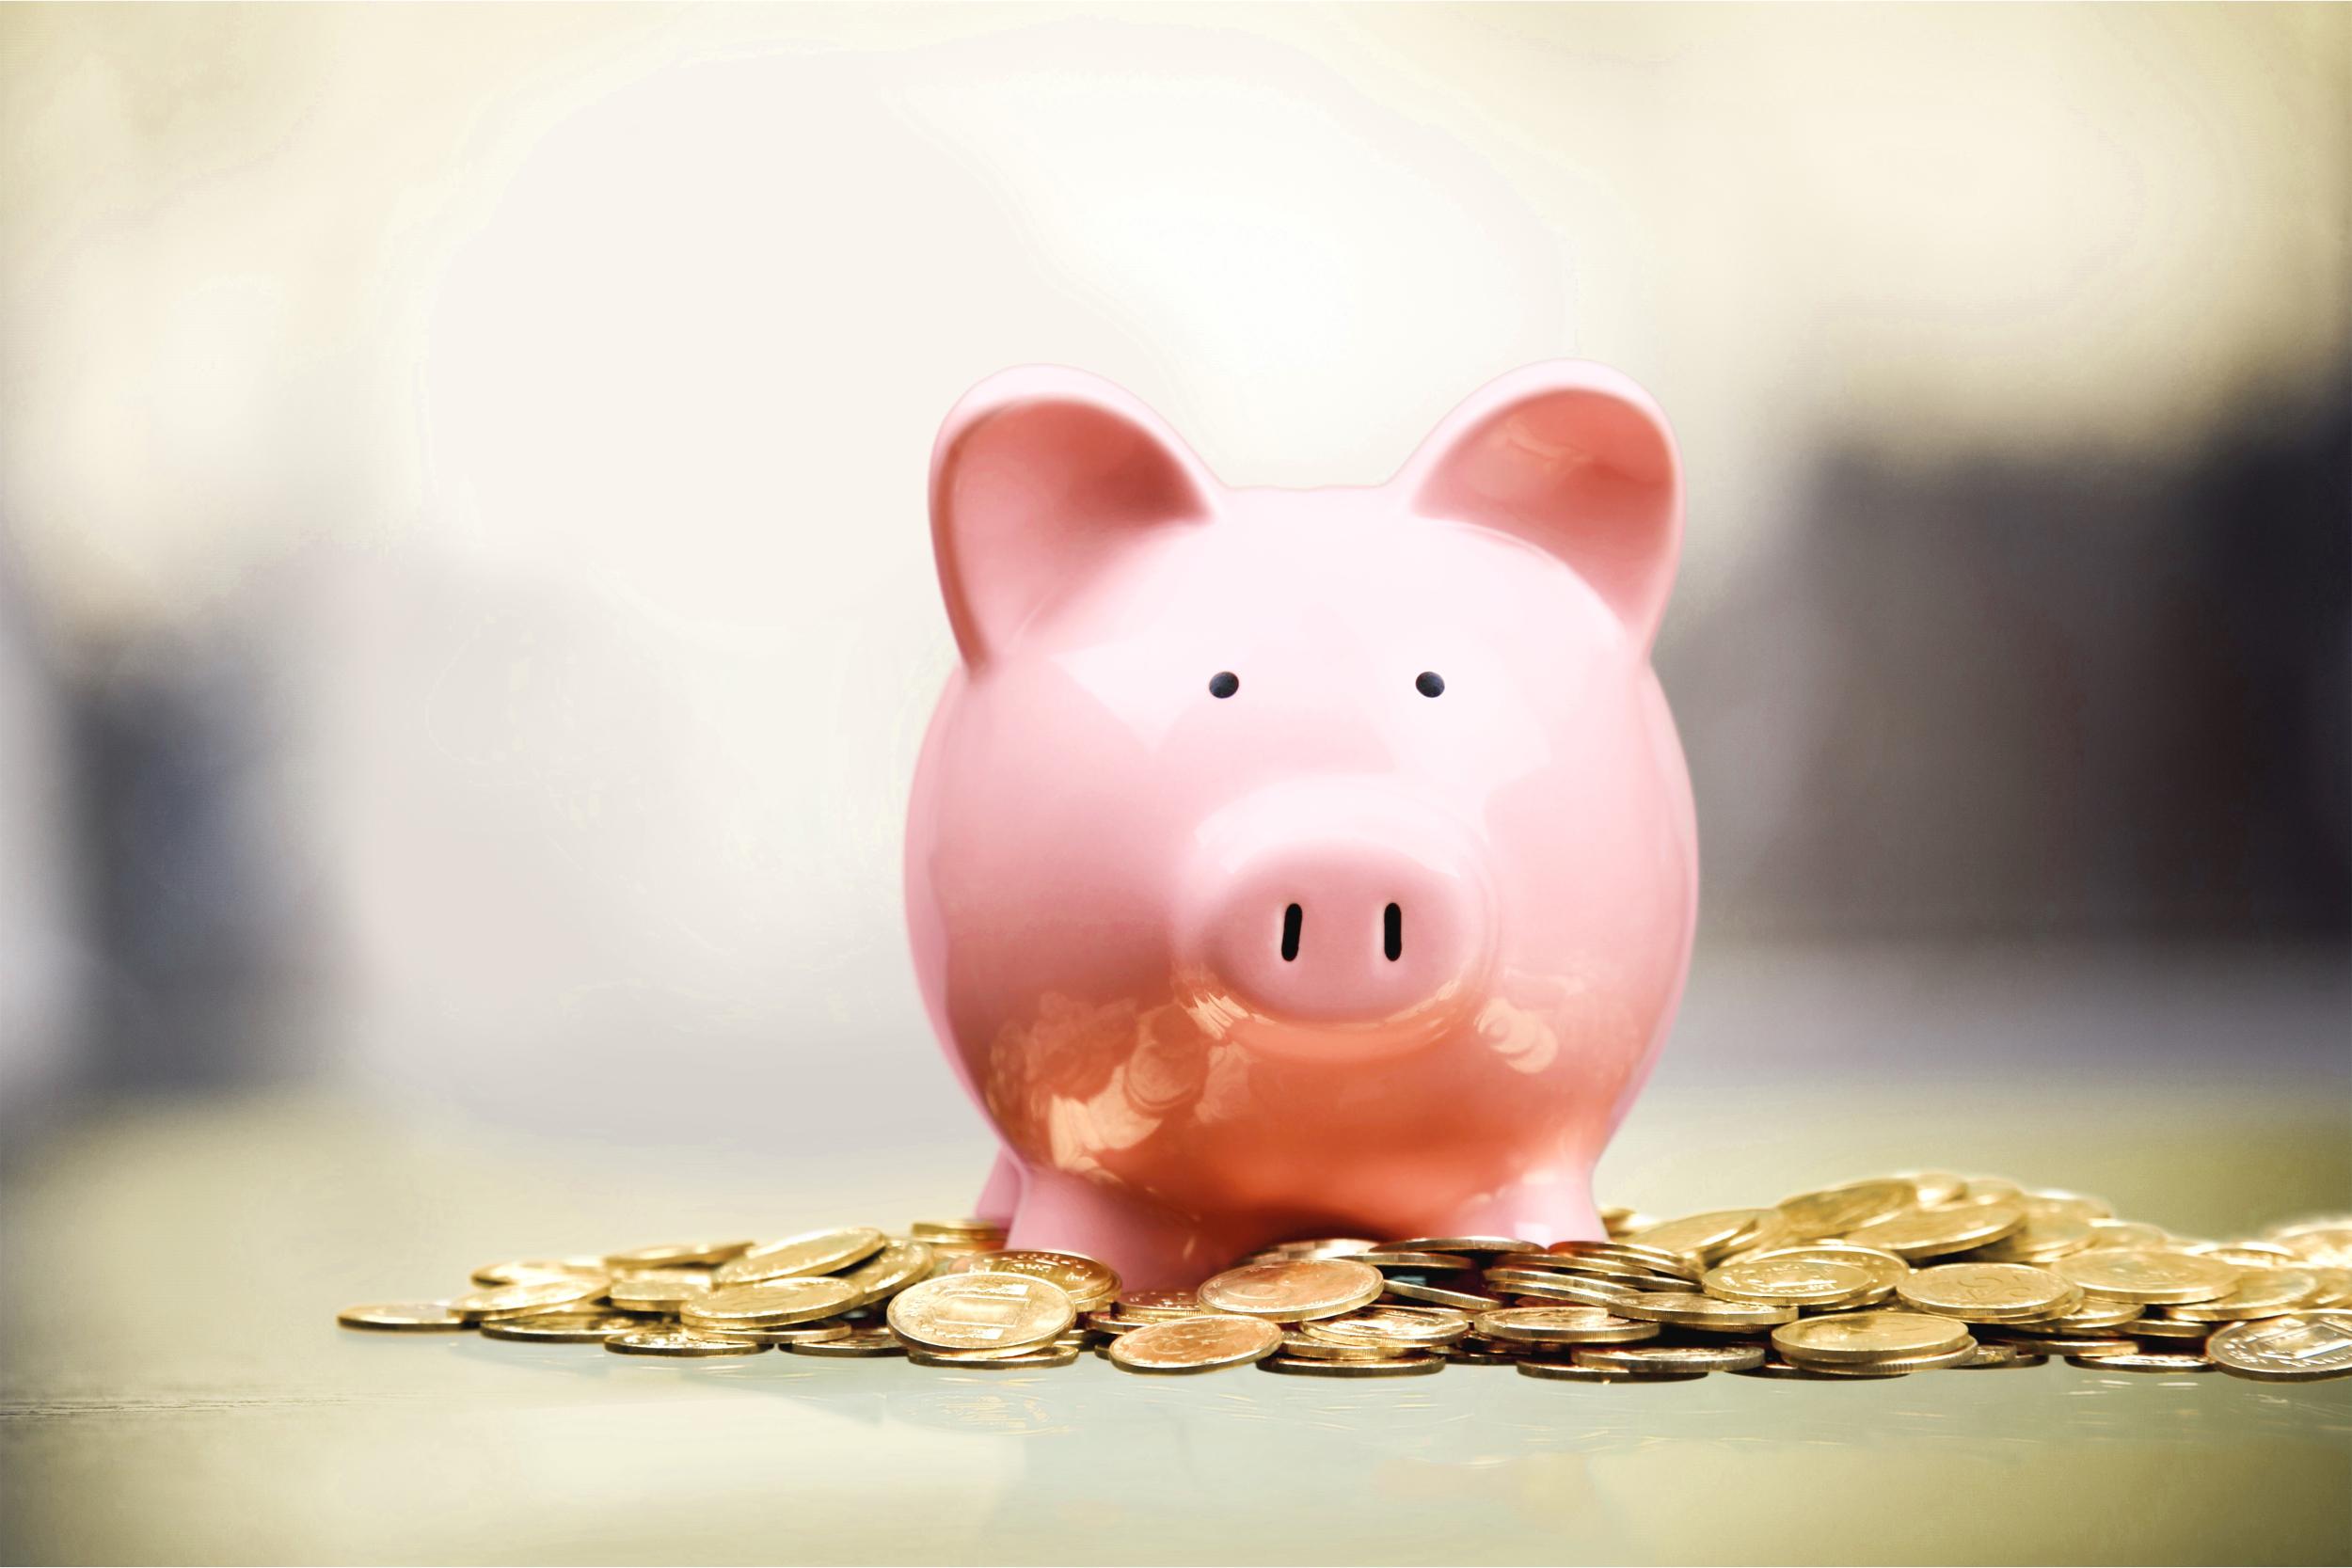 Savings. - FINTT - Inteligência Financeira e Contábil